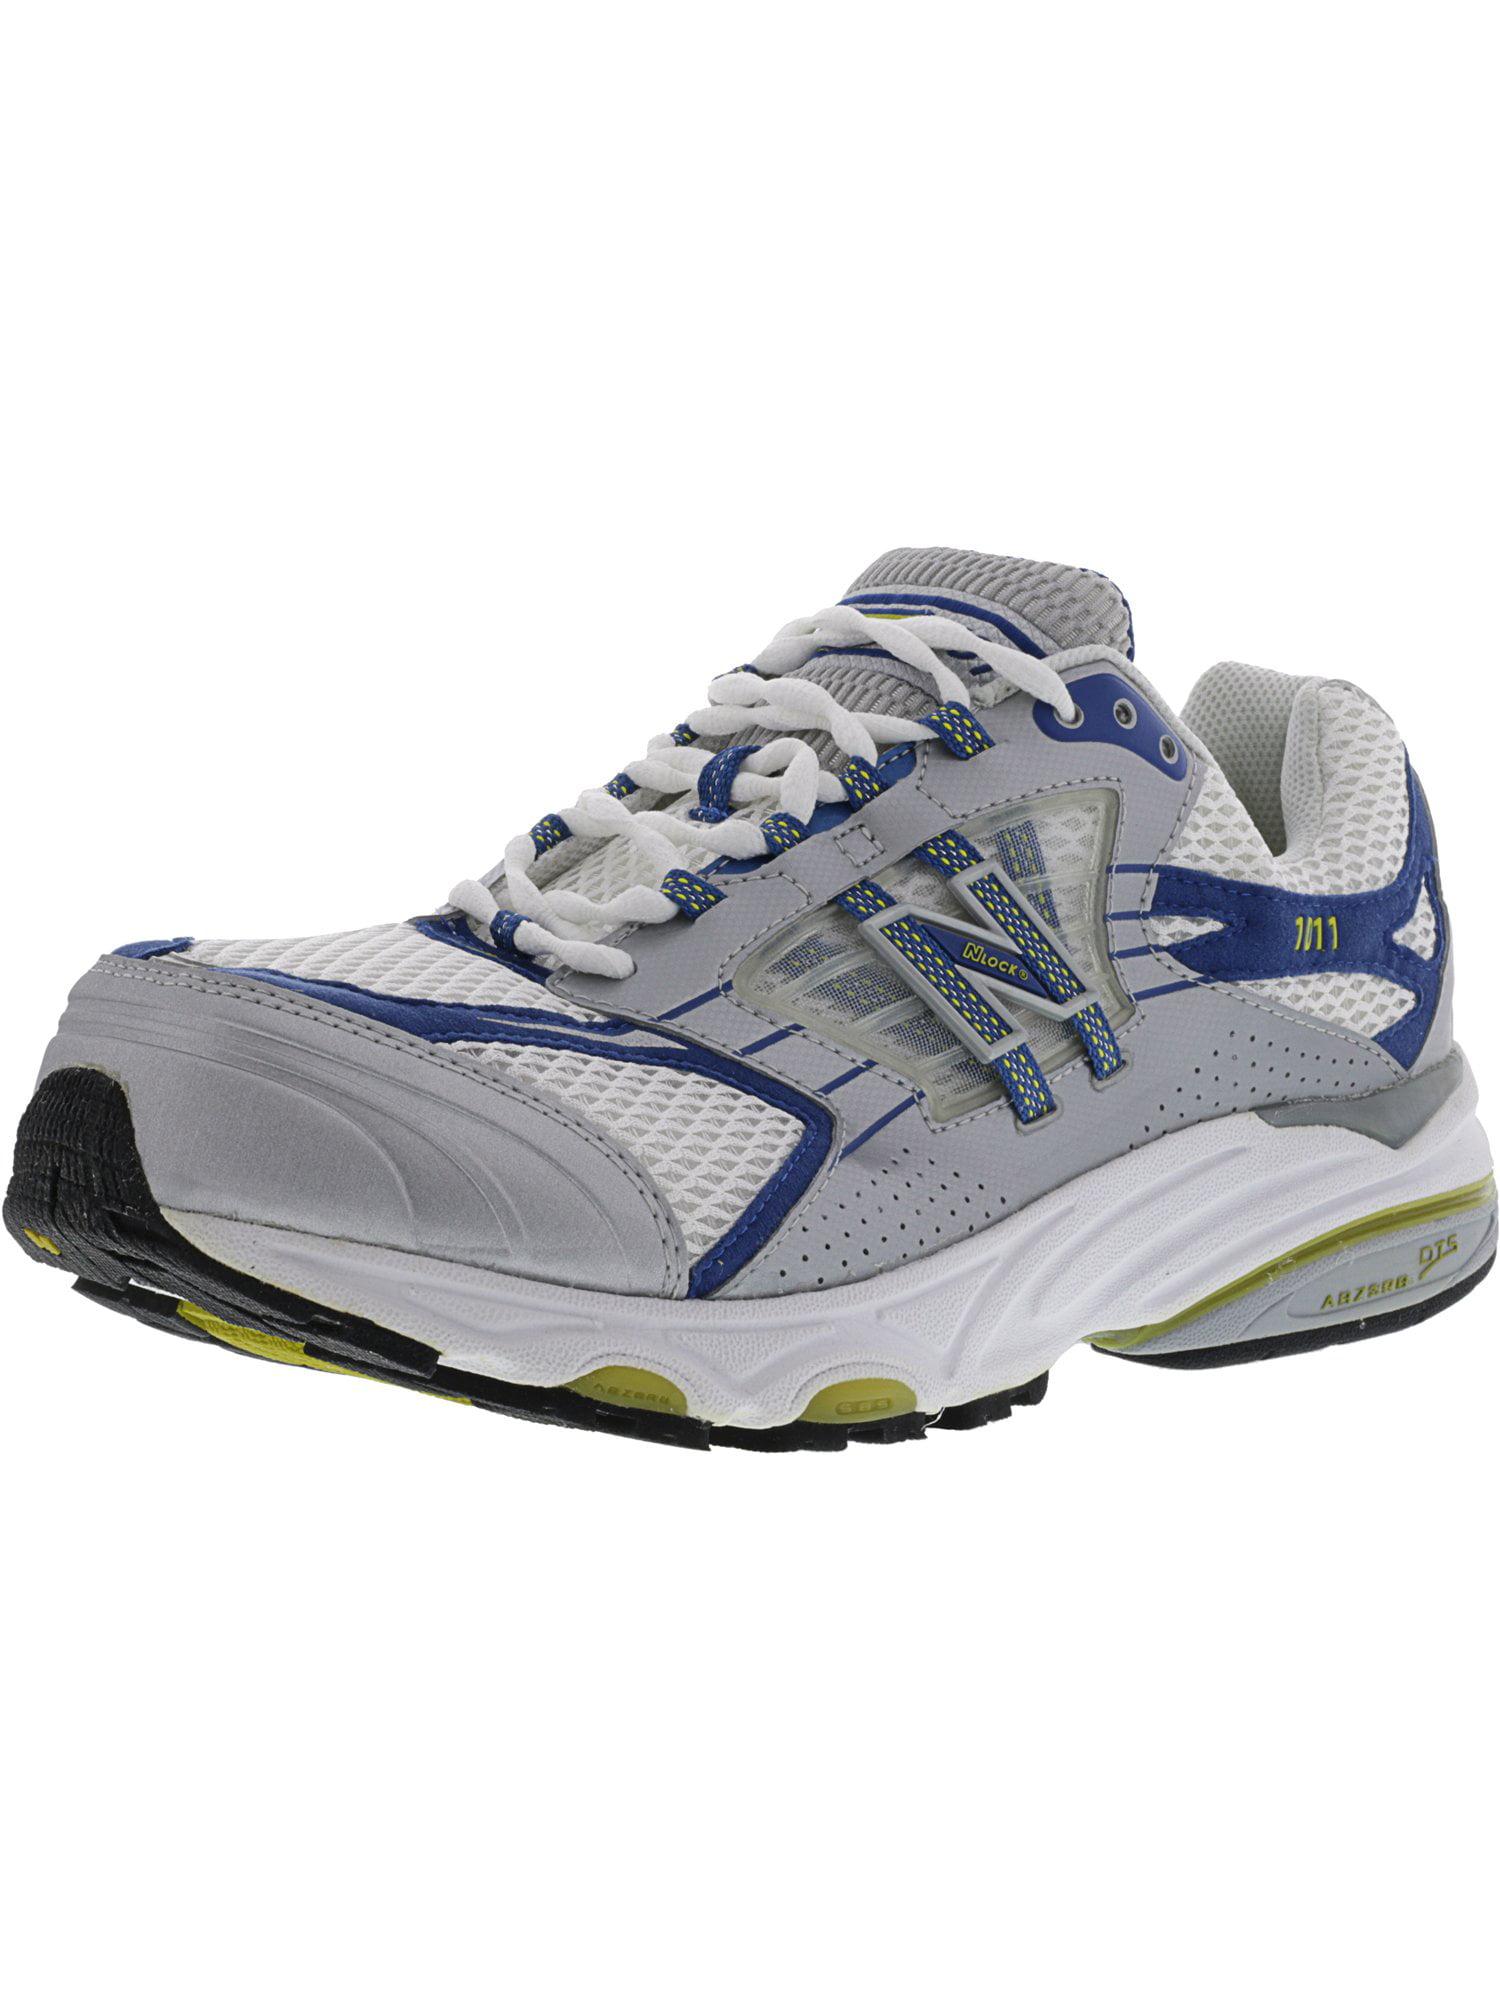 New Balance Women's Wr1011 - Mc Ankle-High Running Shoe - Wr1011 13WW 5eec01